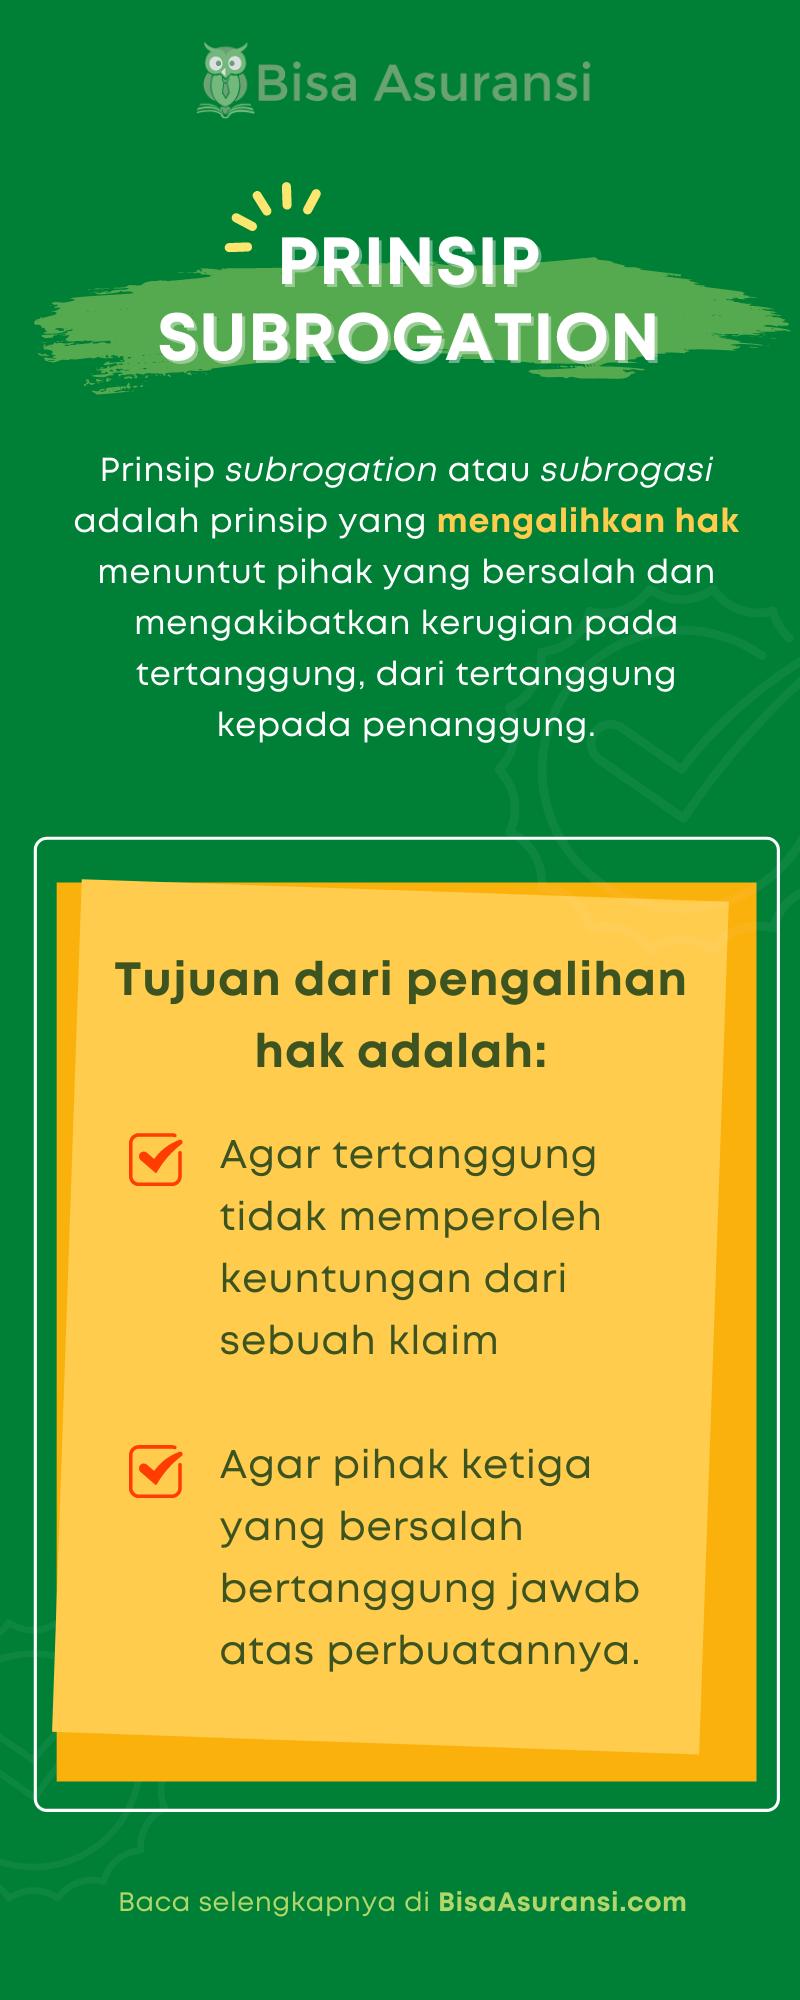 Prinsip subrogation